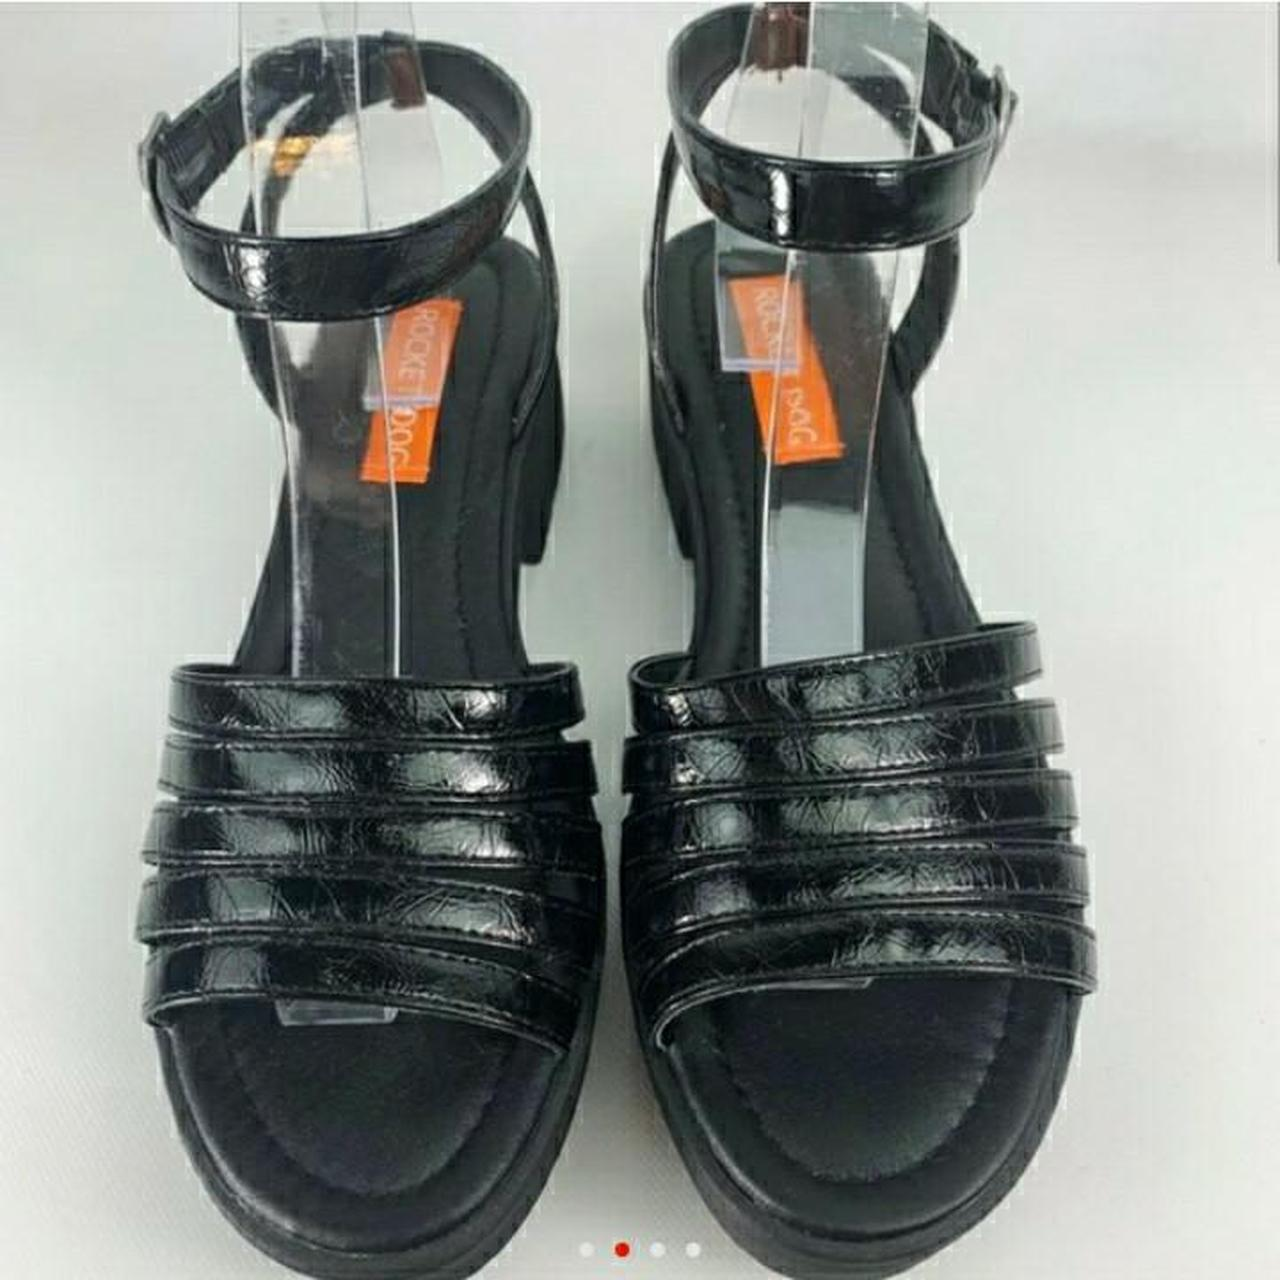 Product Image 1 - Vintage Platform Sandals  -perfect for date